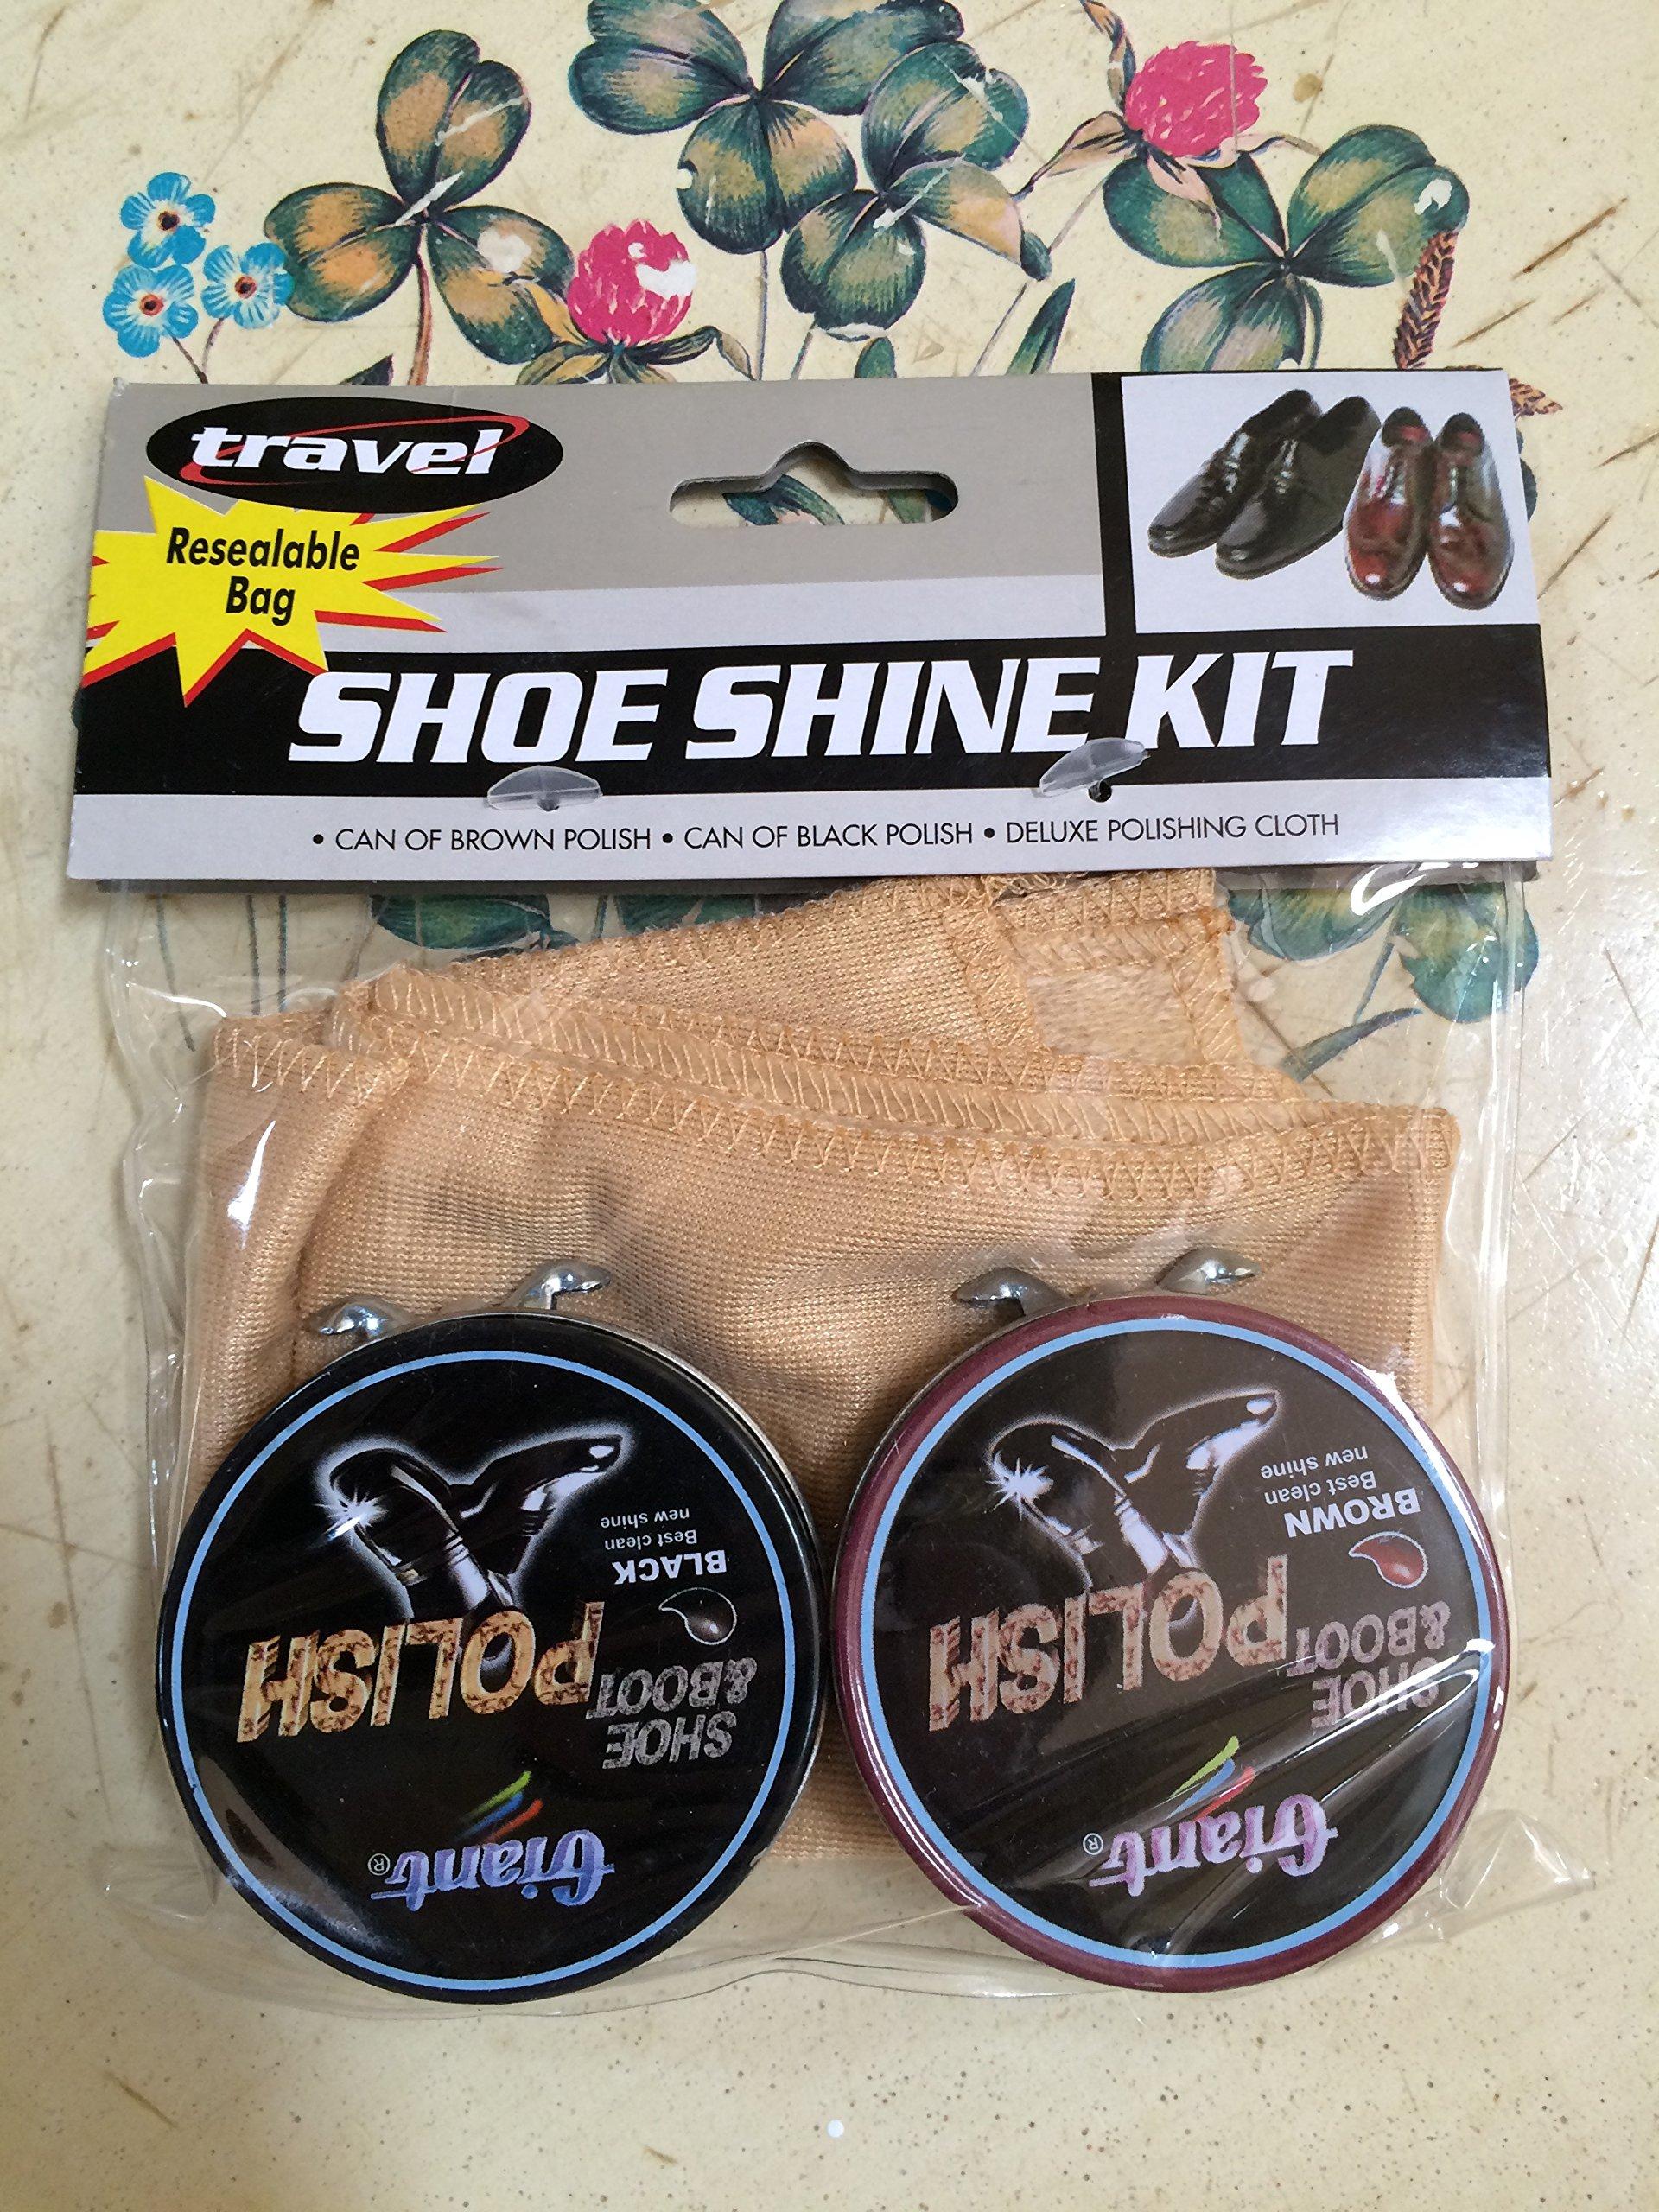 Travel Shoe Shine Kit ~ Resealable bag ~ Brown & Black